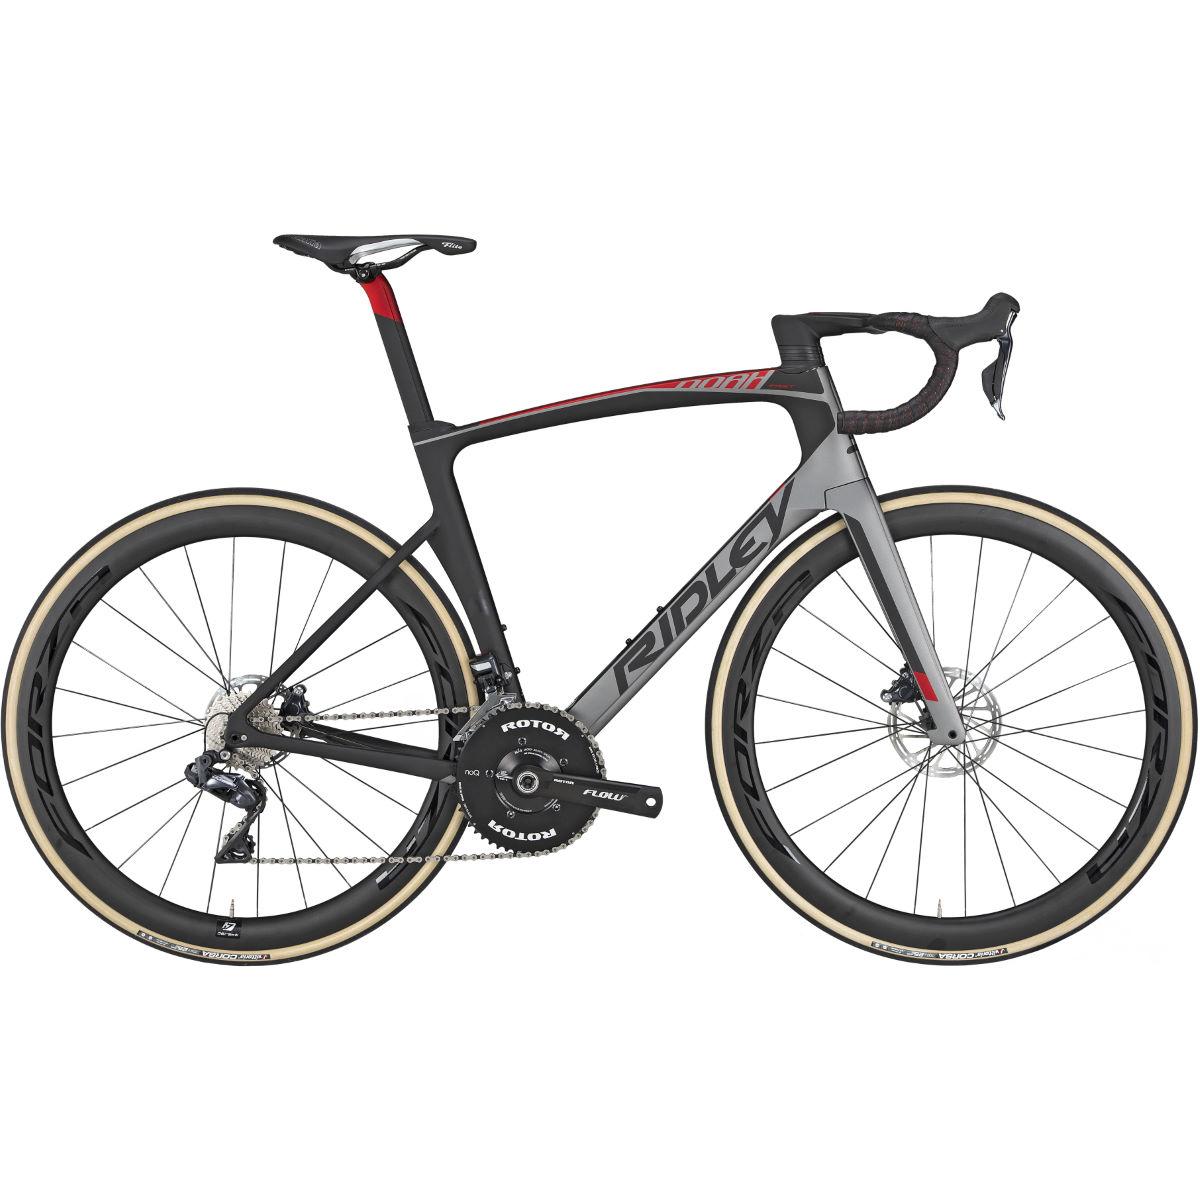 Ridley Noah Fast Ultegra Di2 Disc 2019 Bikes